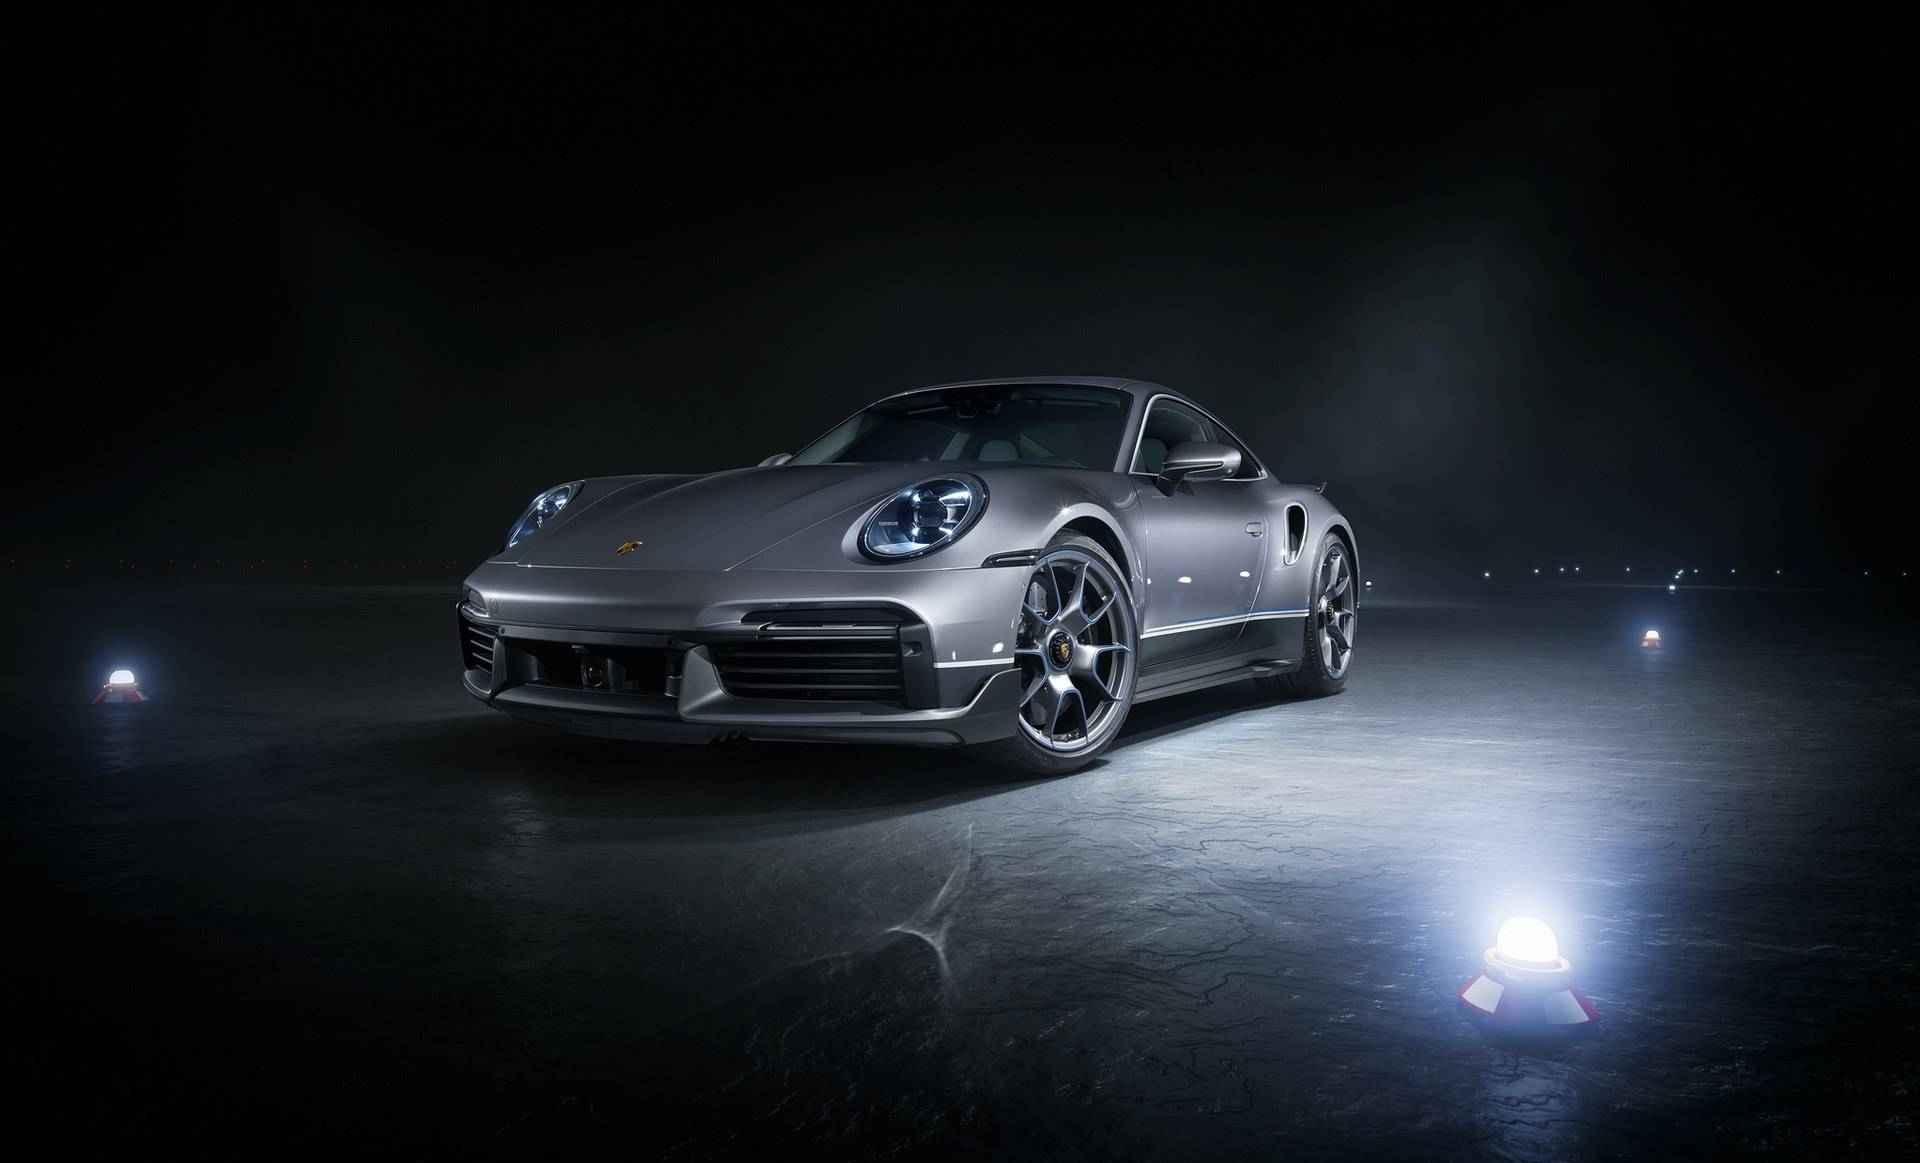 Embraer_Porsche_911_Turbo_S_0002